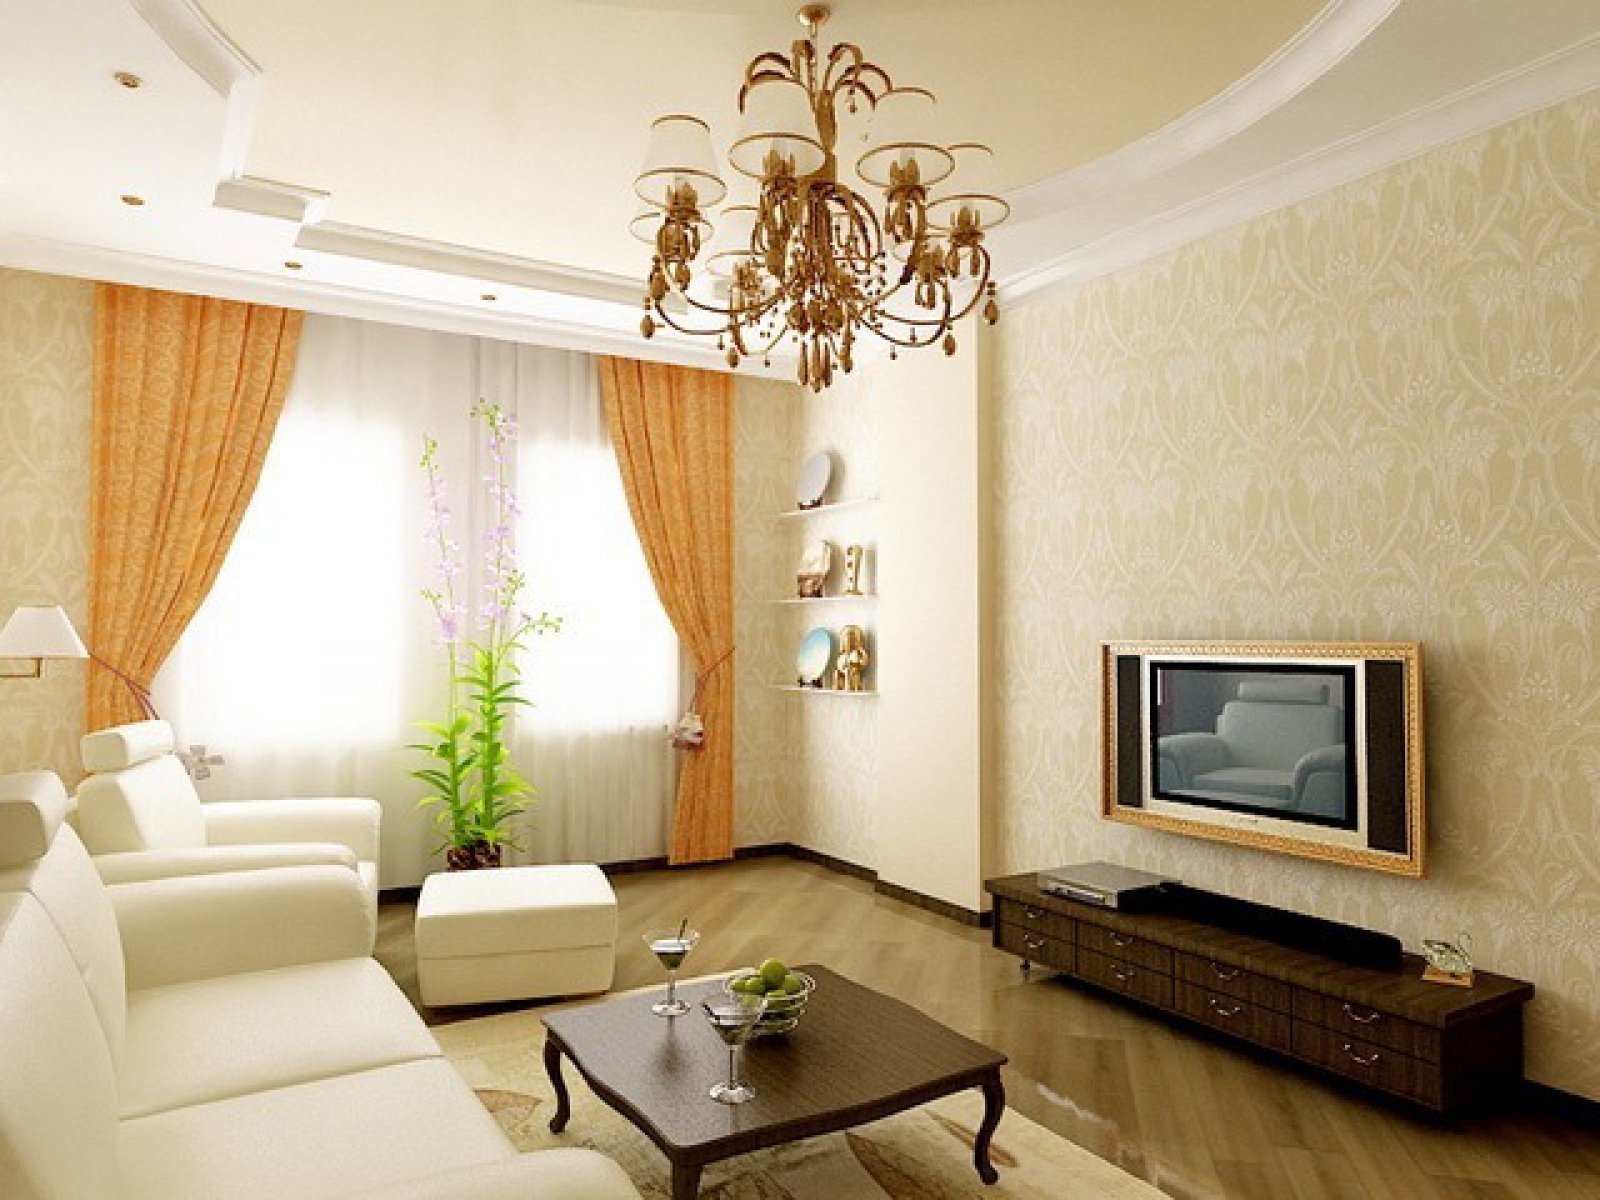 Идеи ремонта хрущевки гостиной фото